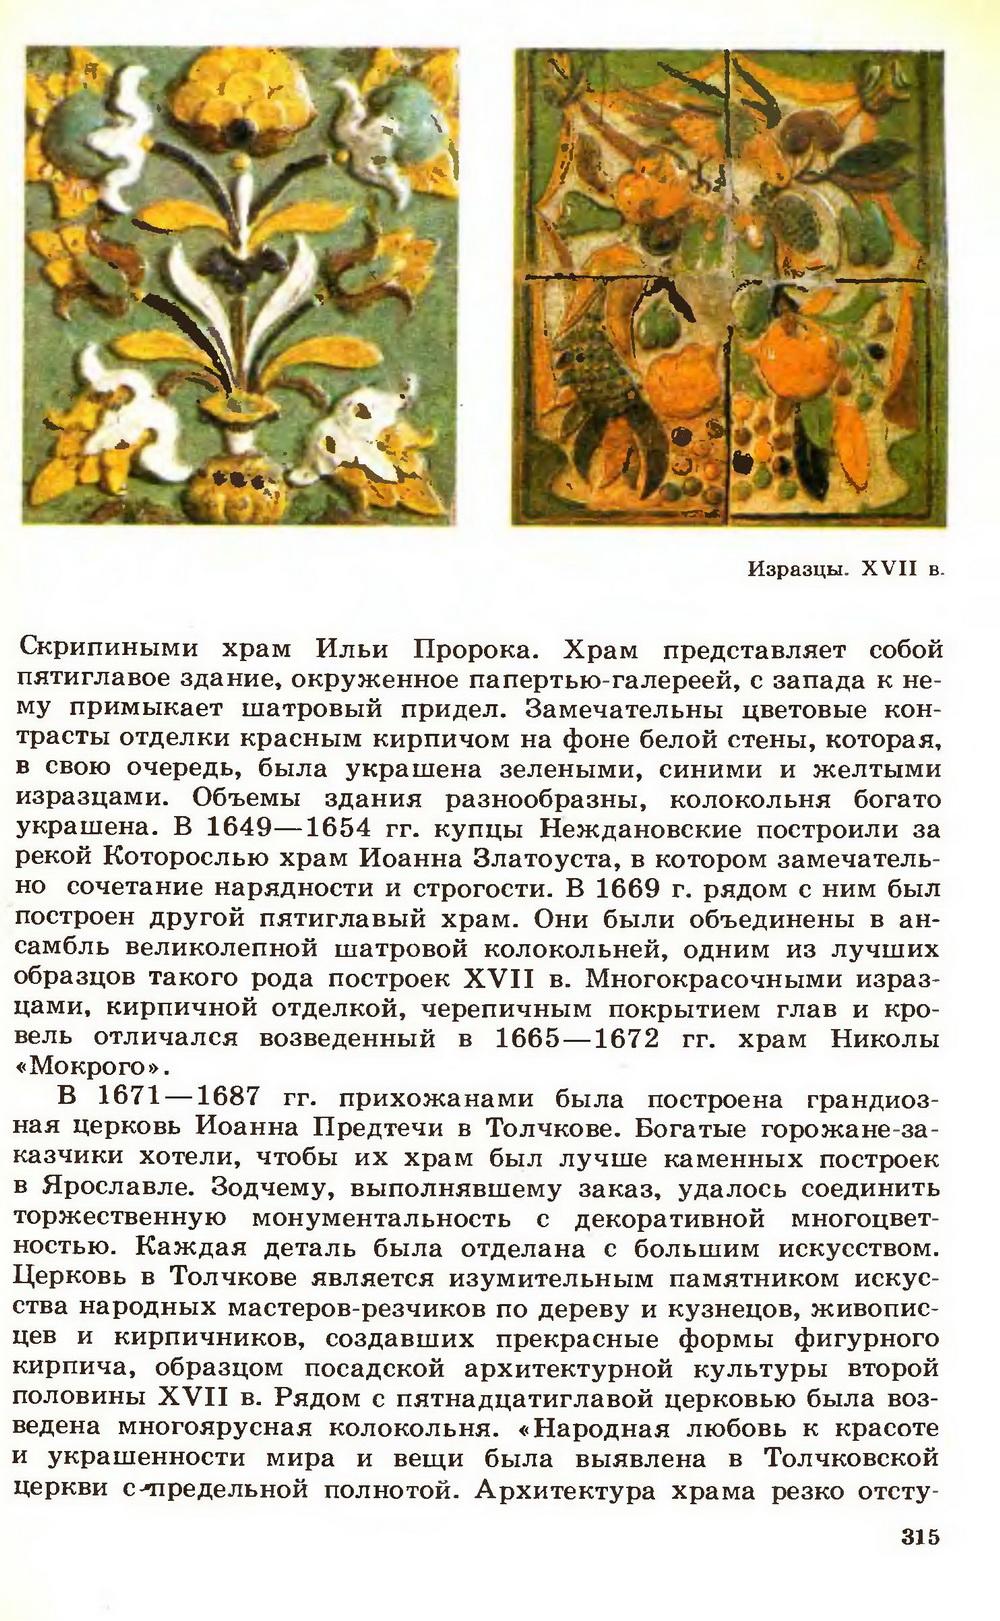 http://i1.imageban.ru/out/2017/06/15/6bd9d5bb910acc1d17c4904263c9a1a8.jpg